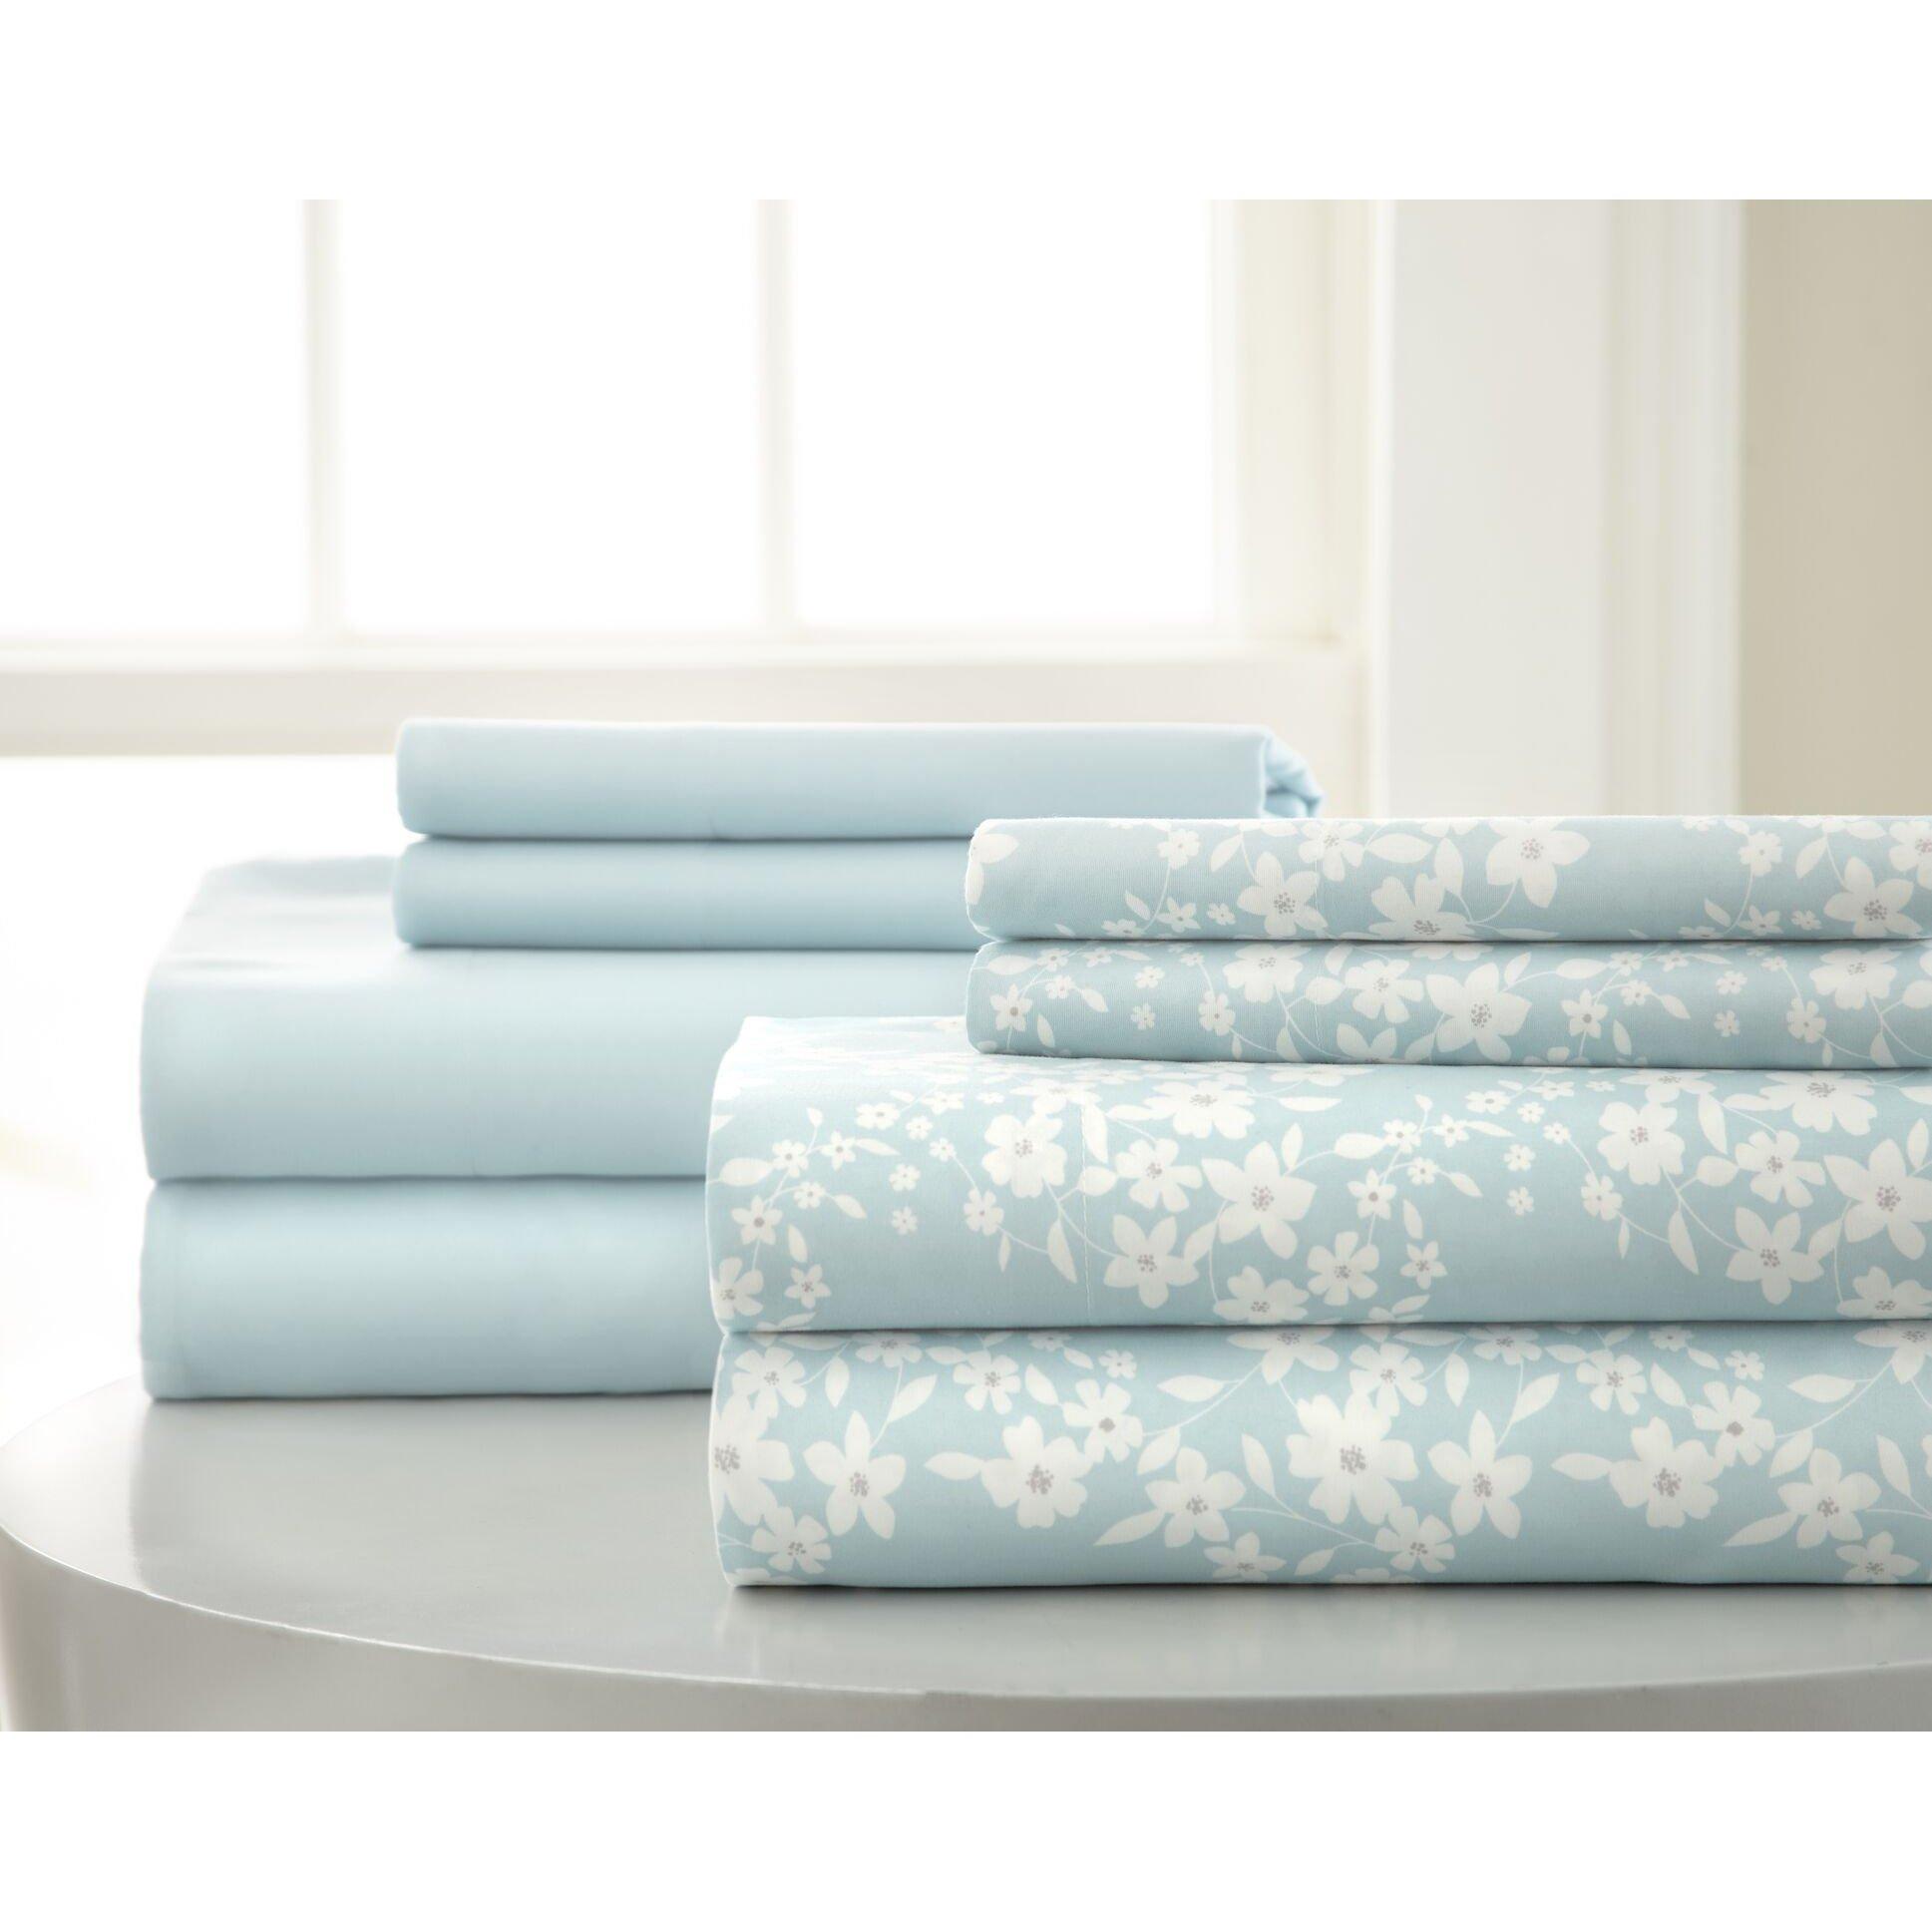 Floral Blue Sheets